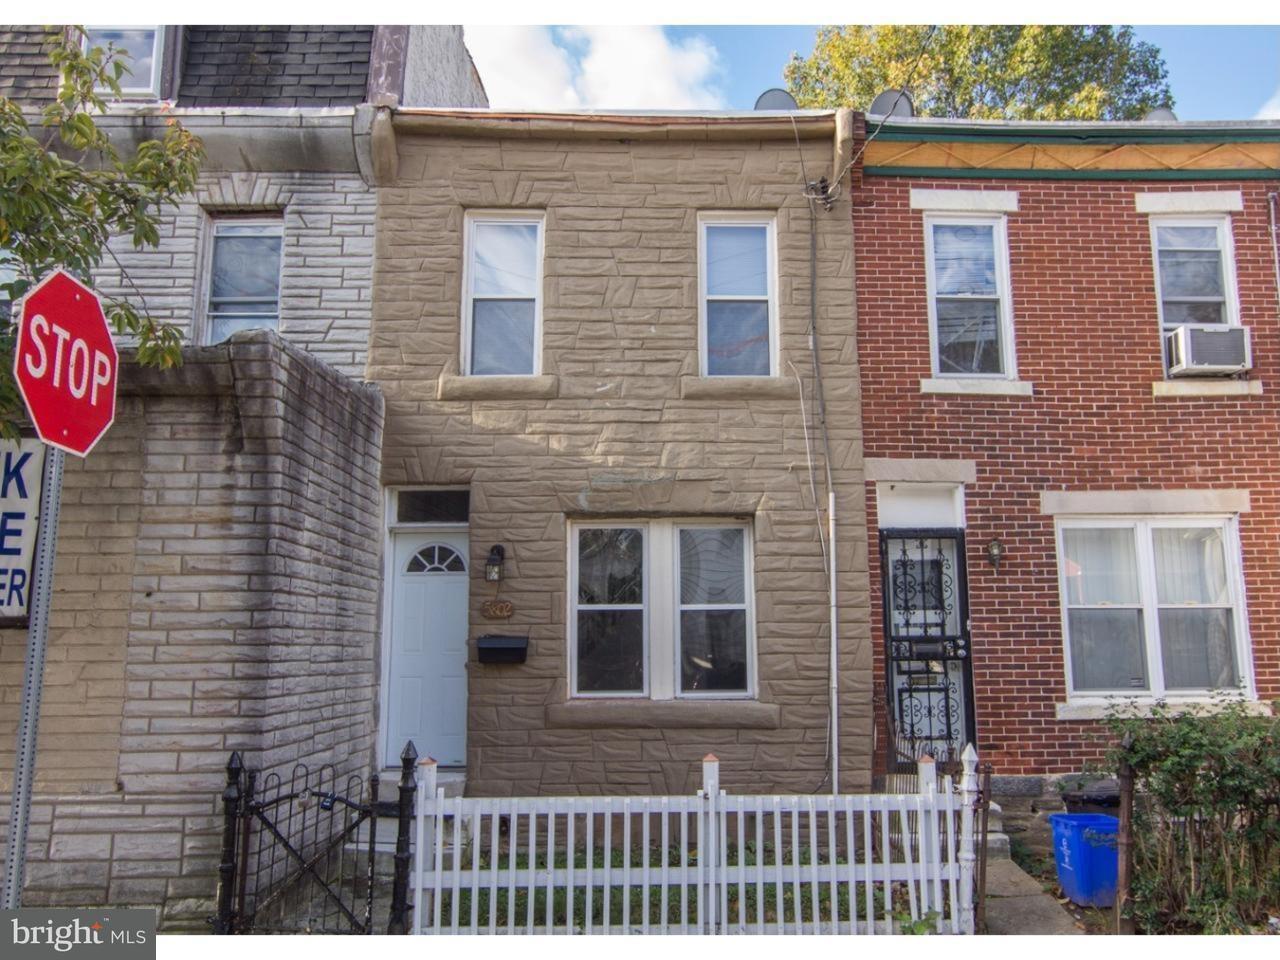 5802  Knox Philadelphia, PA 19144